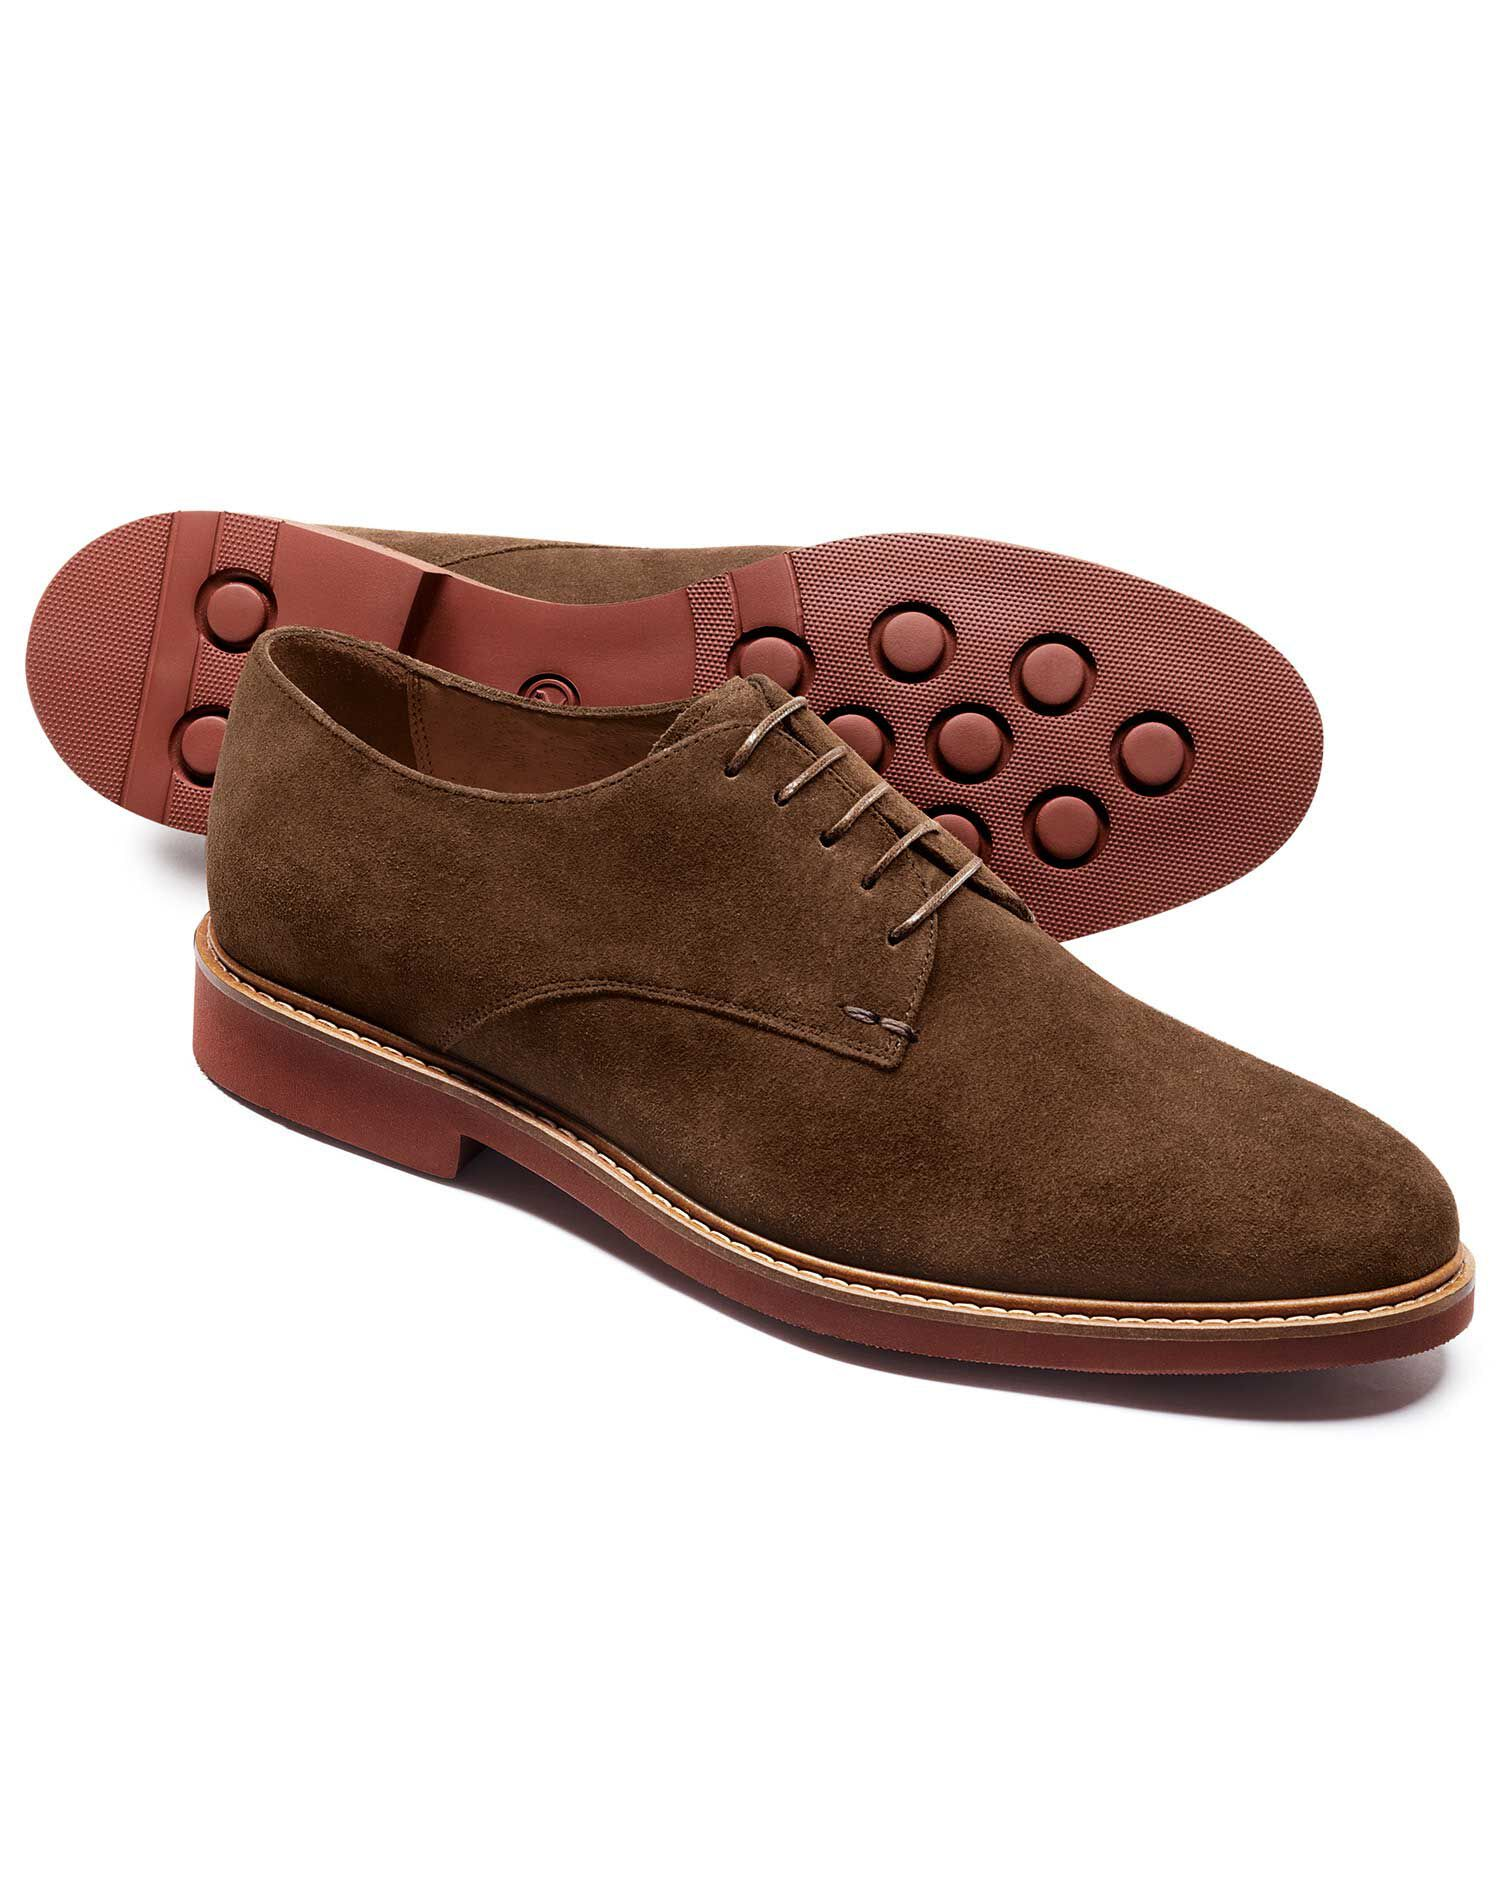 Brown Truscott Suede Plain Derby Shoe Size 10 R by Charles Tyrwhitt